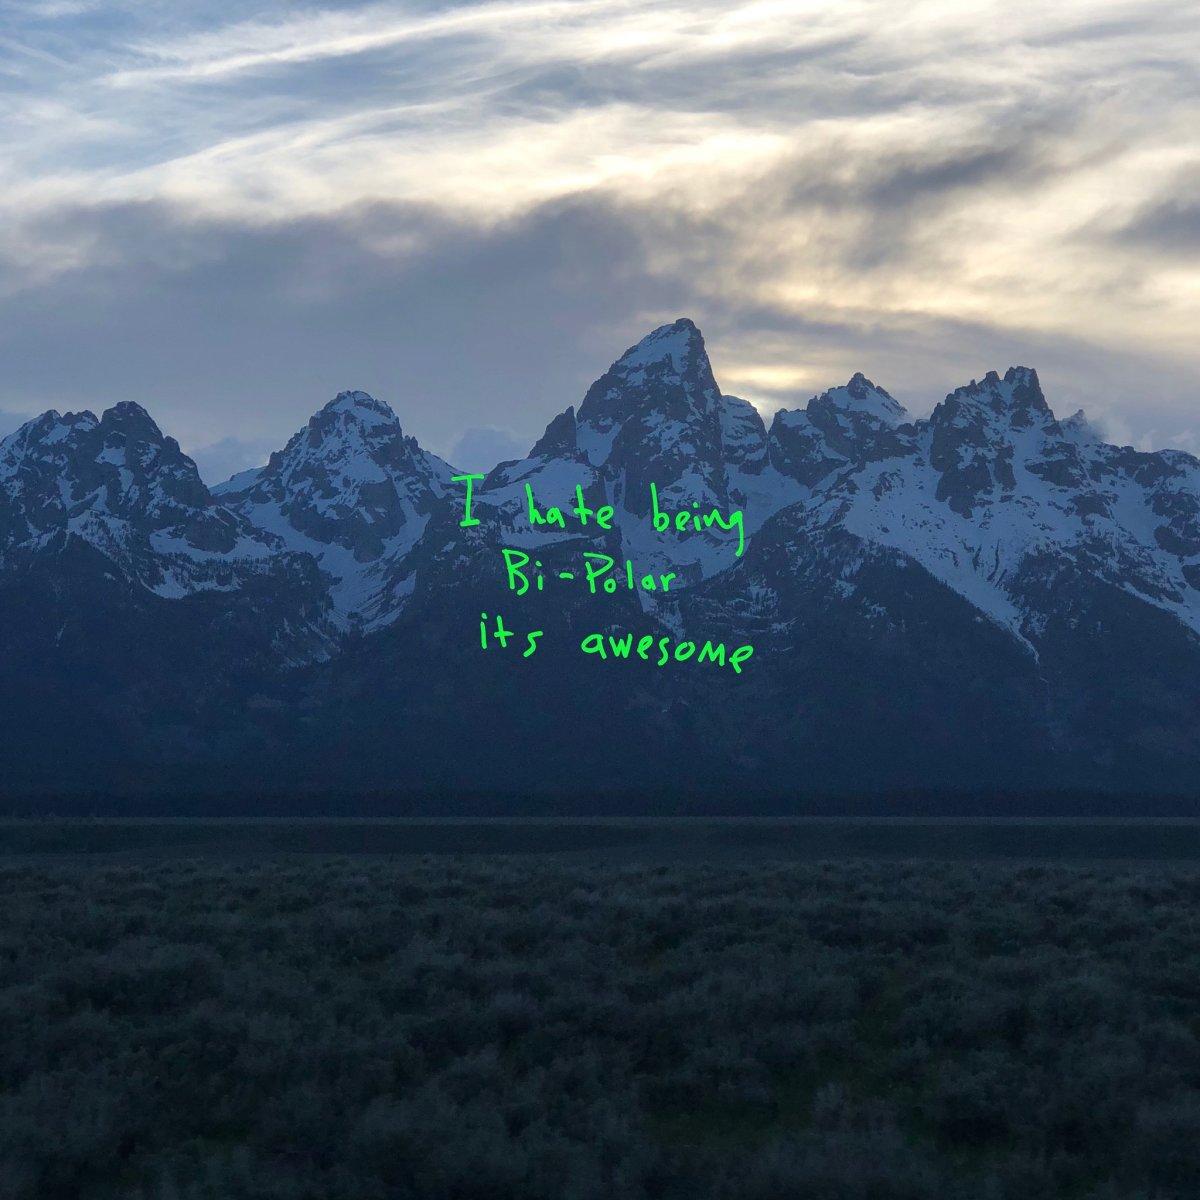 Kanye West 'Ye' album art